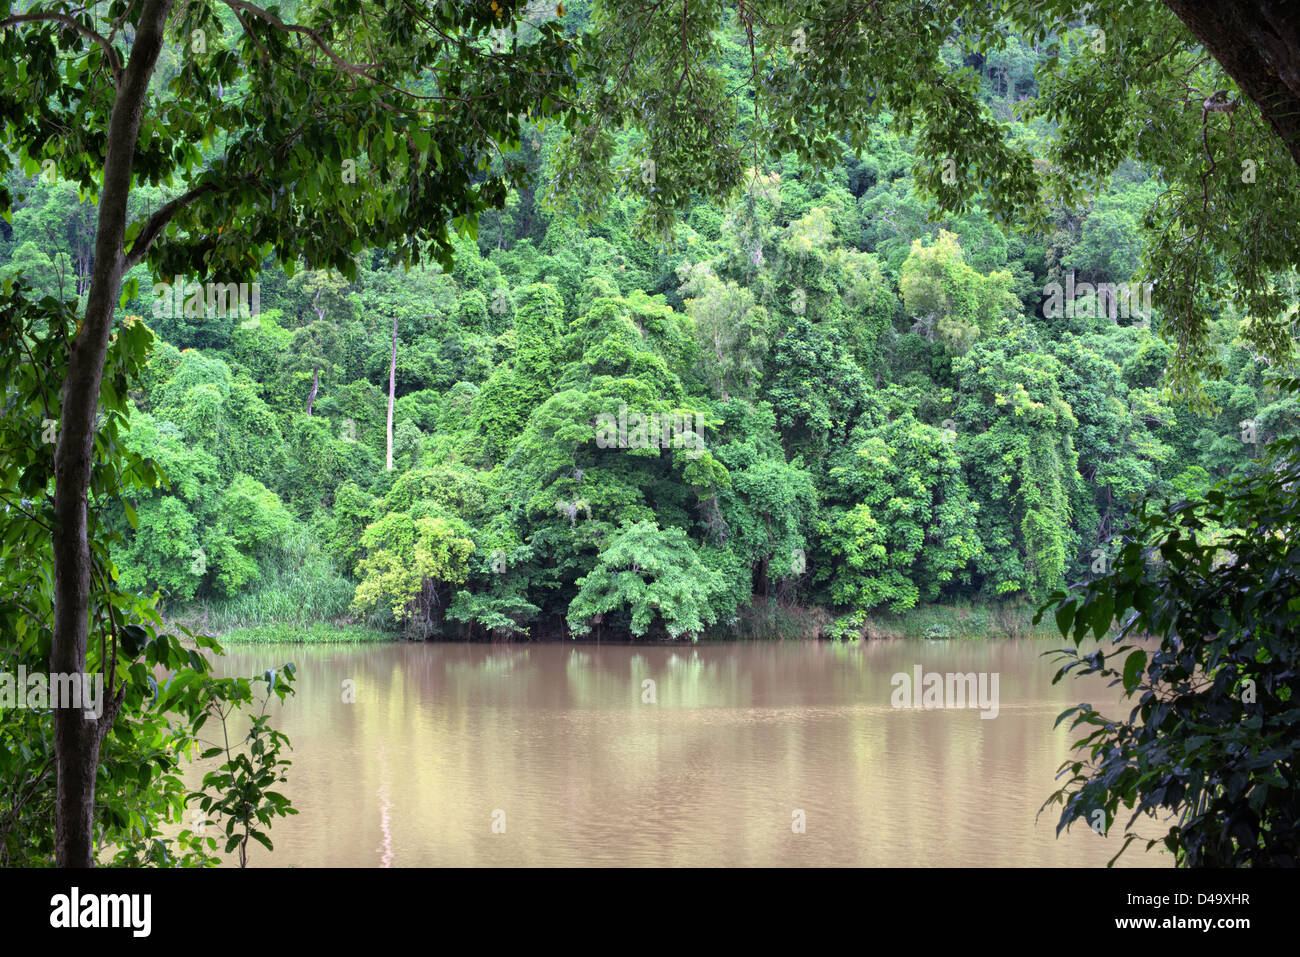 Lake Placid, Cairns, Far North Queensland, Australia - Stock Image